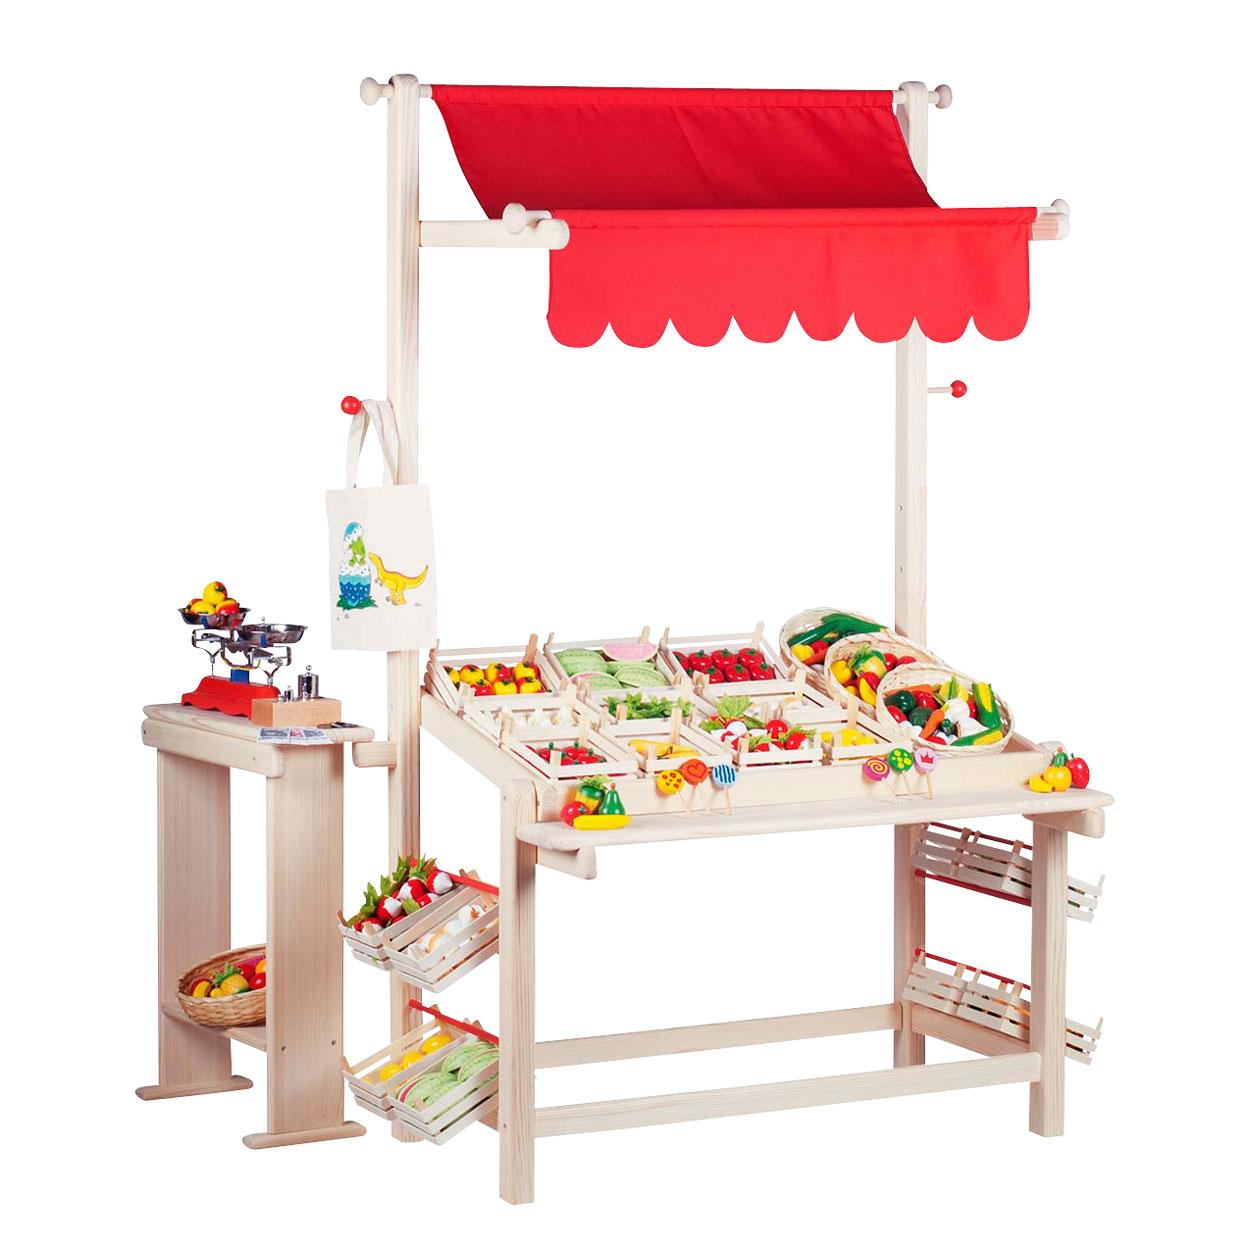 speelgoedwinkeltje marktkraam